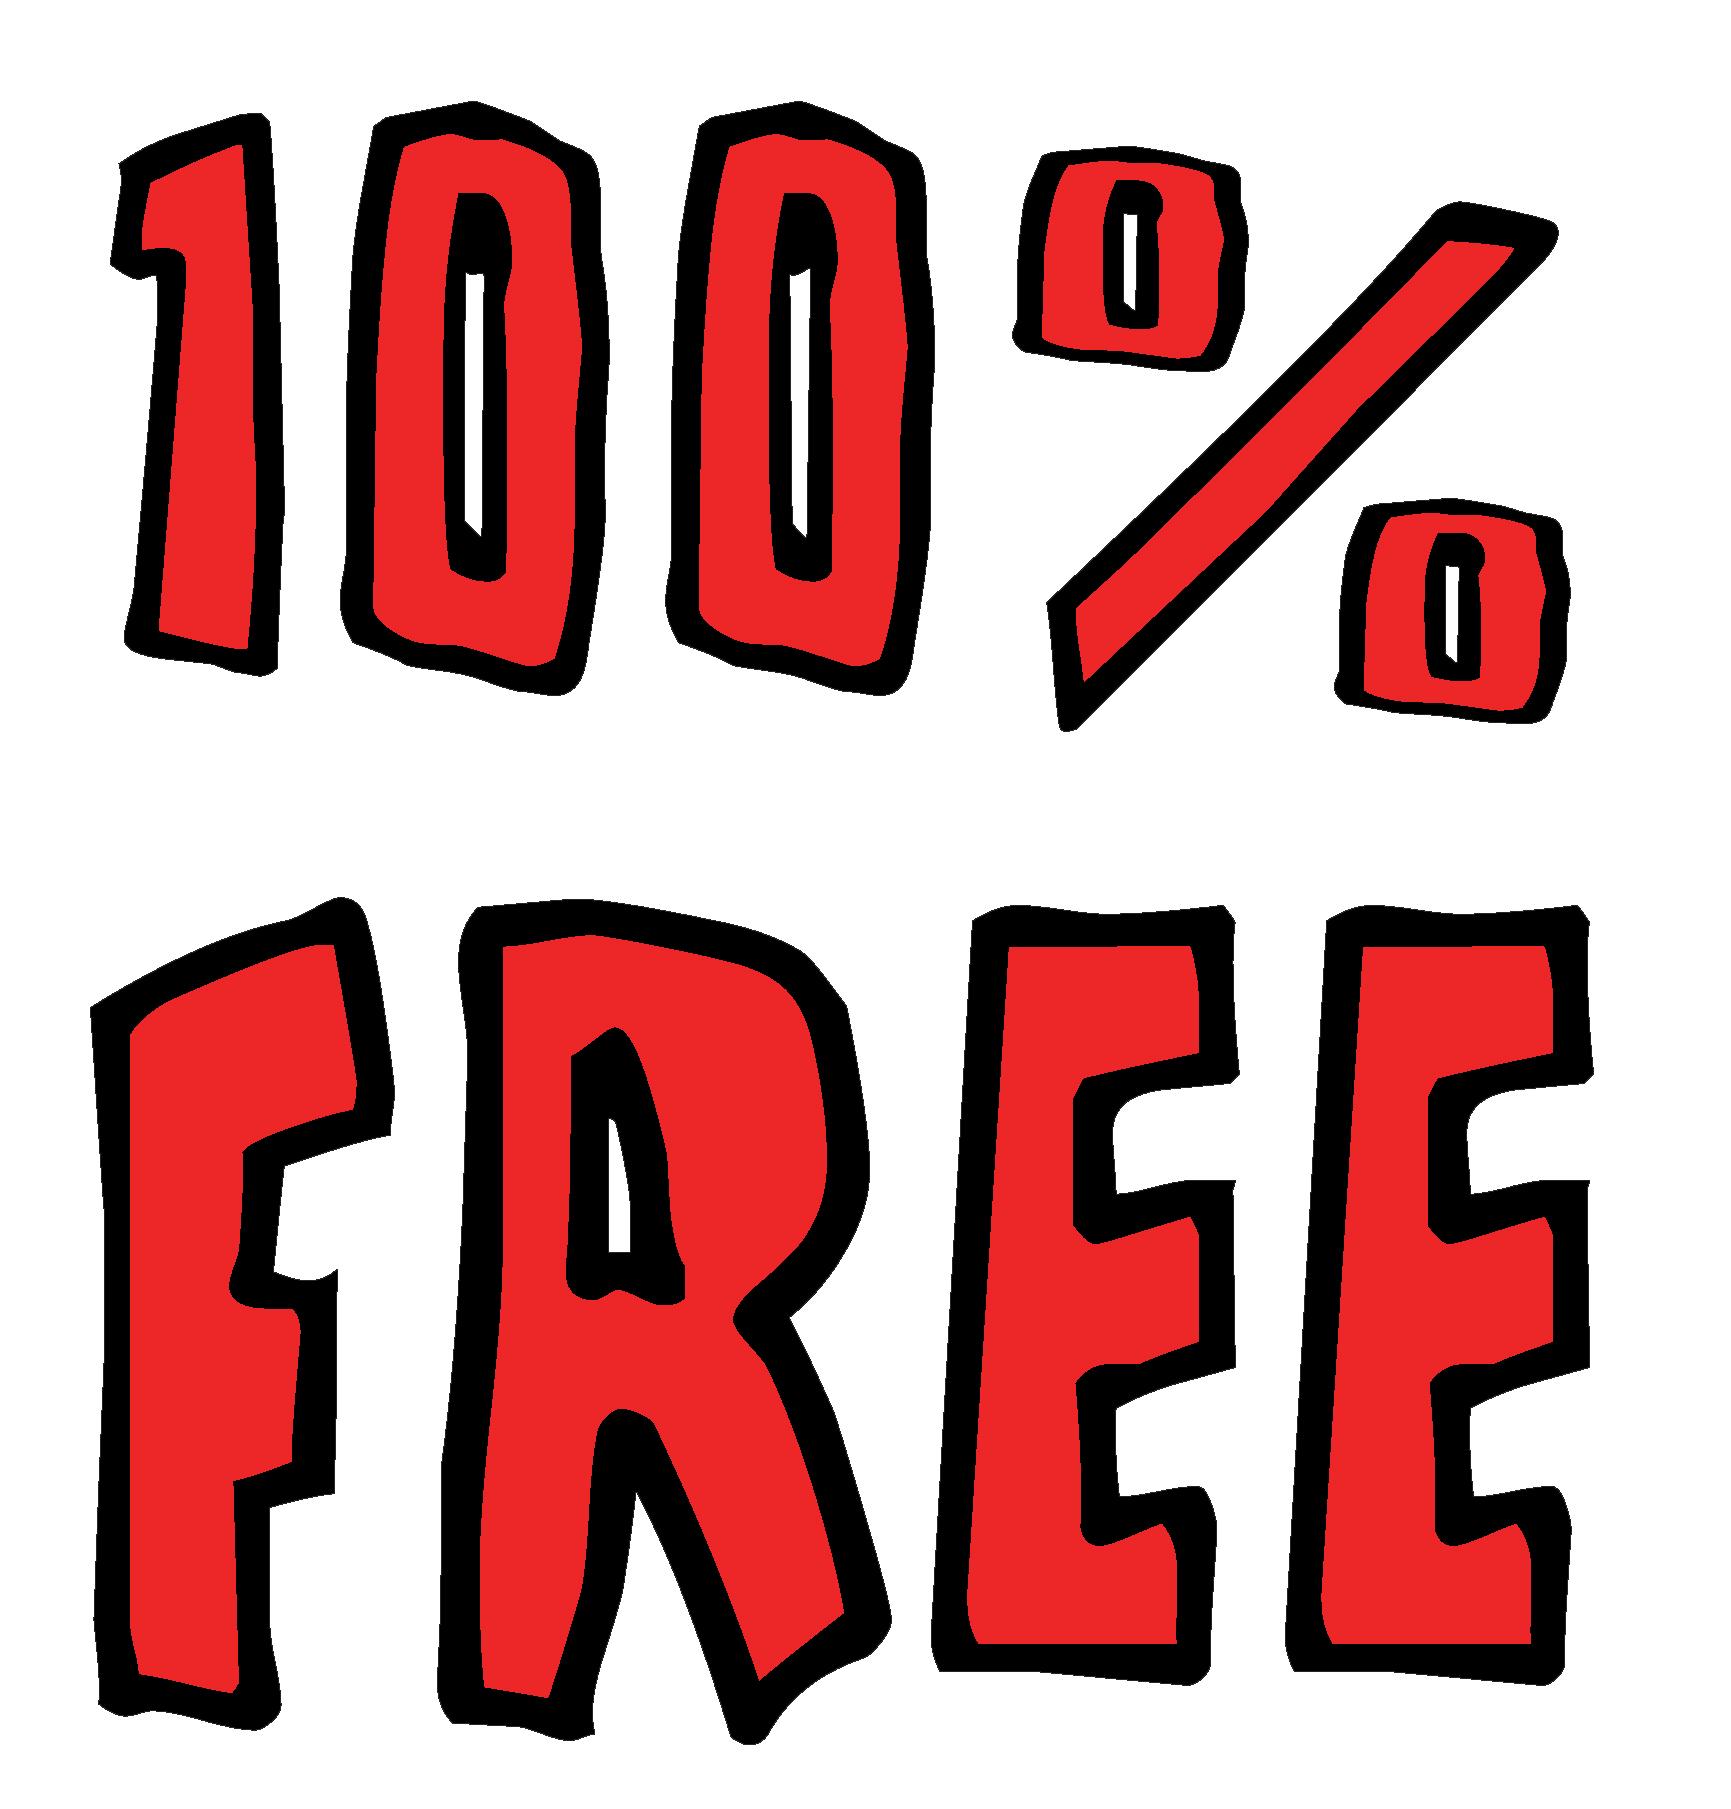 100 FREE (Red).jpg